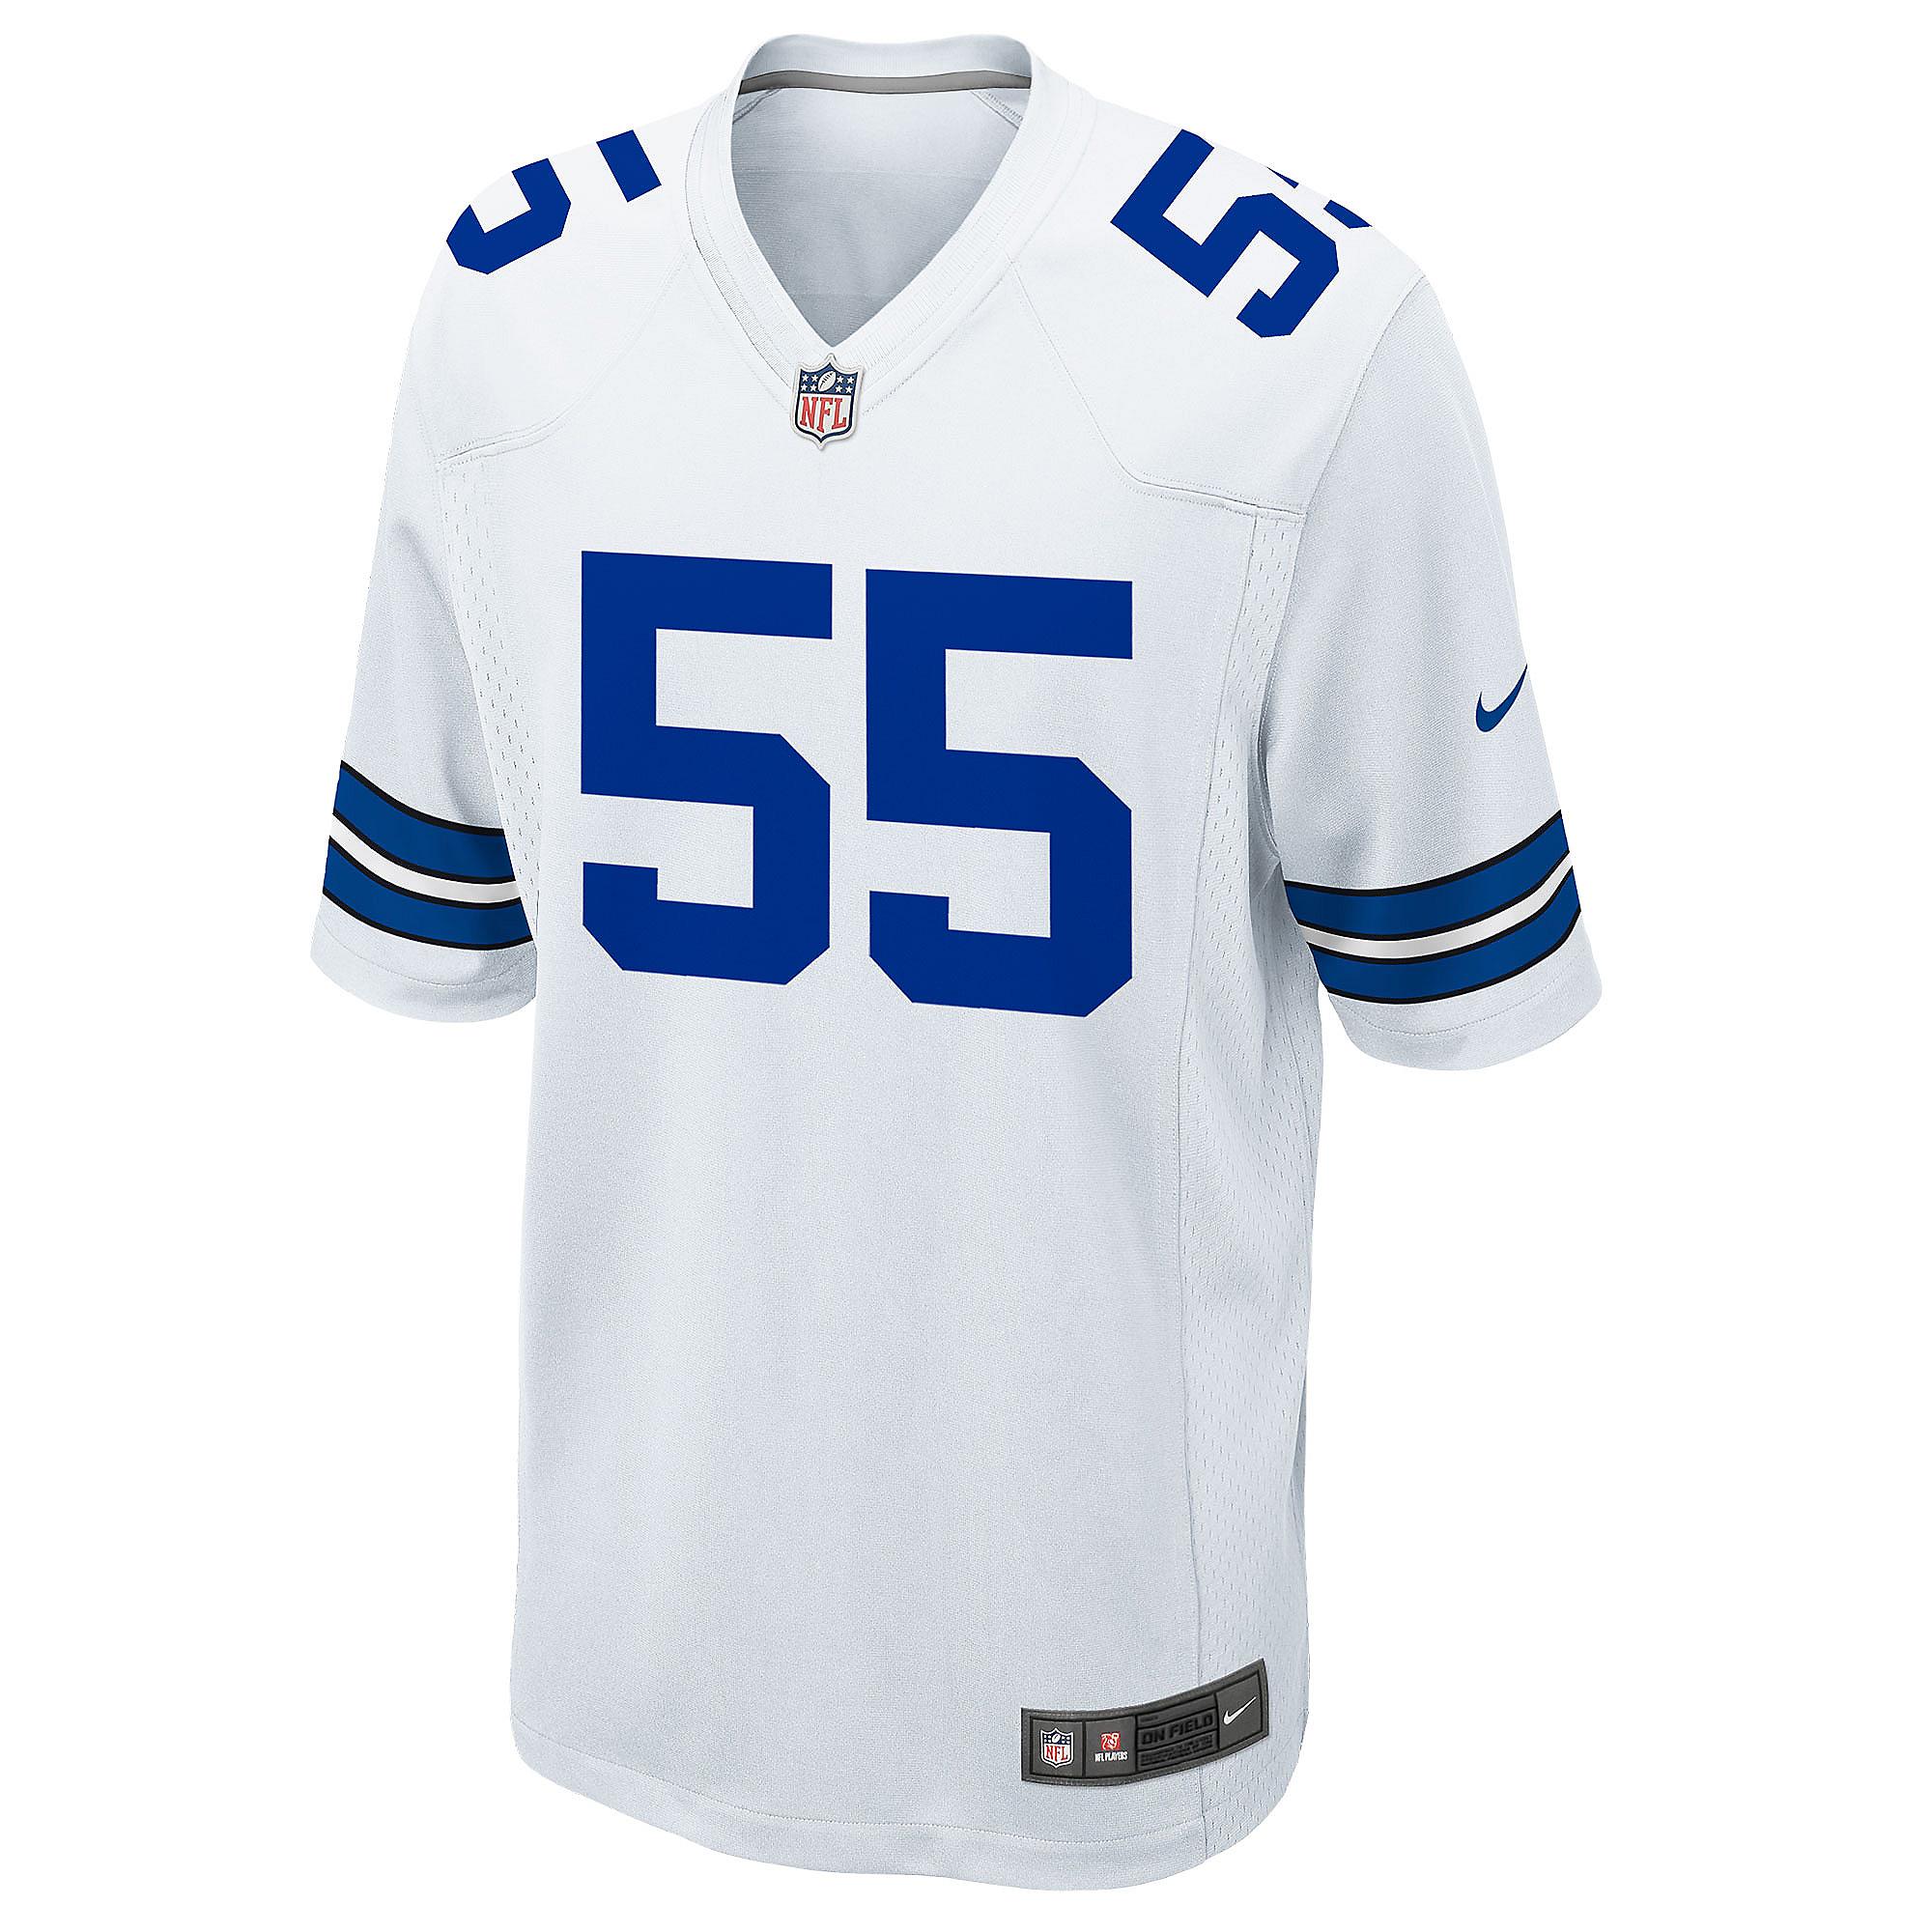 new styles 534b8 ac716 Dallas Cowboys Leighton Vander Esch #55 Nike White Game ...